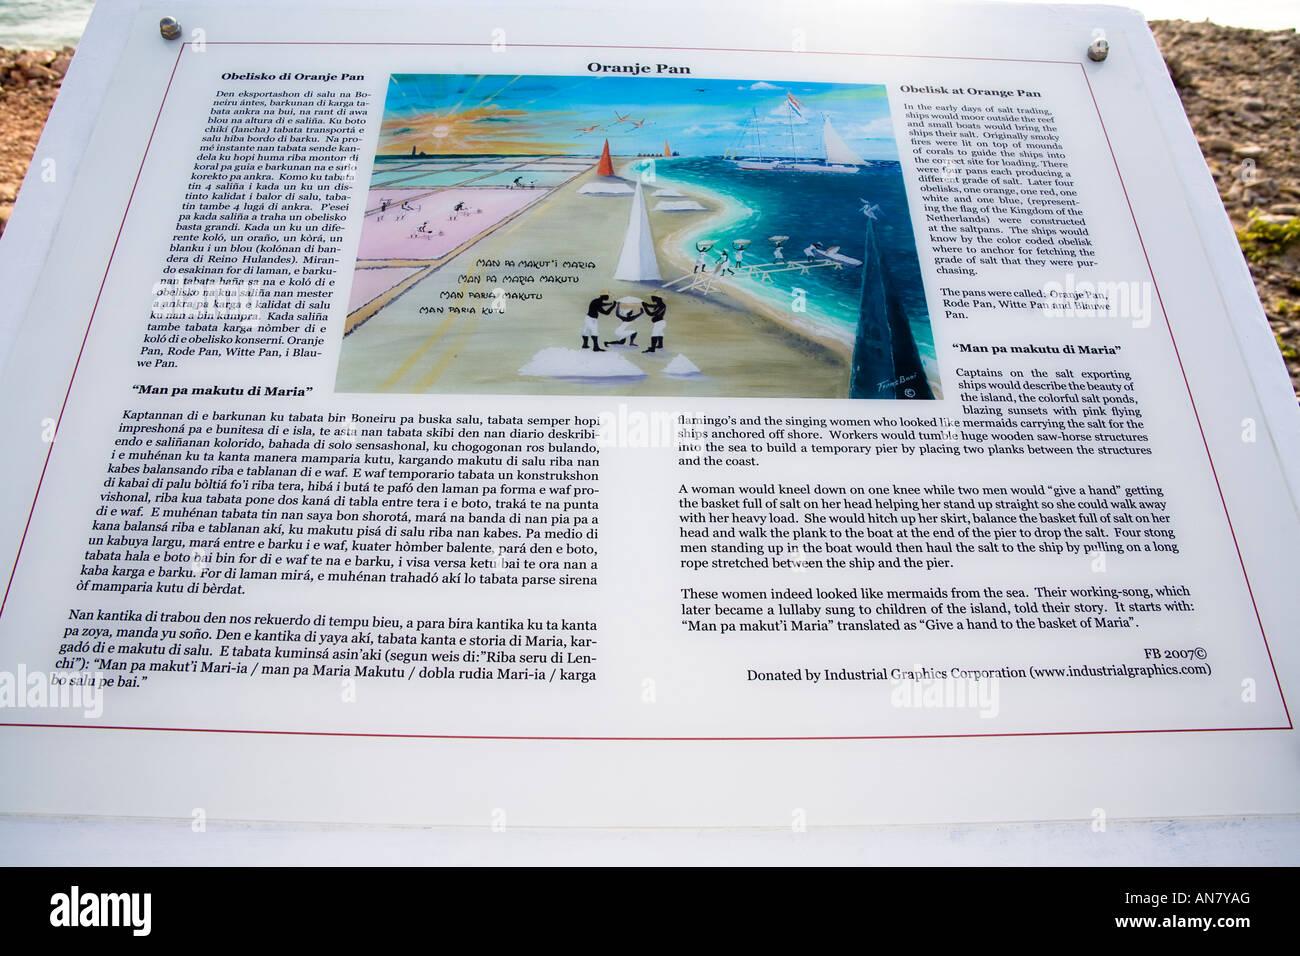 Interpretation Board at Oranje Pan on the Caribbean Island of Bonaire - Stock Image